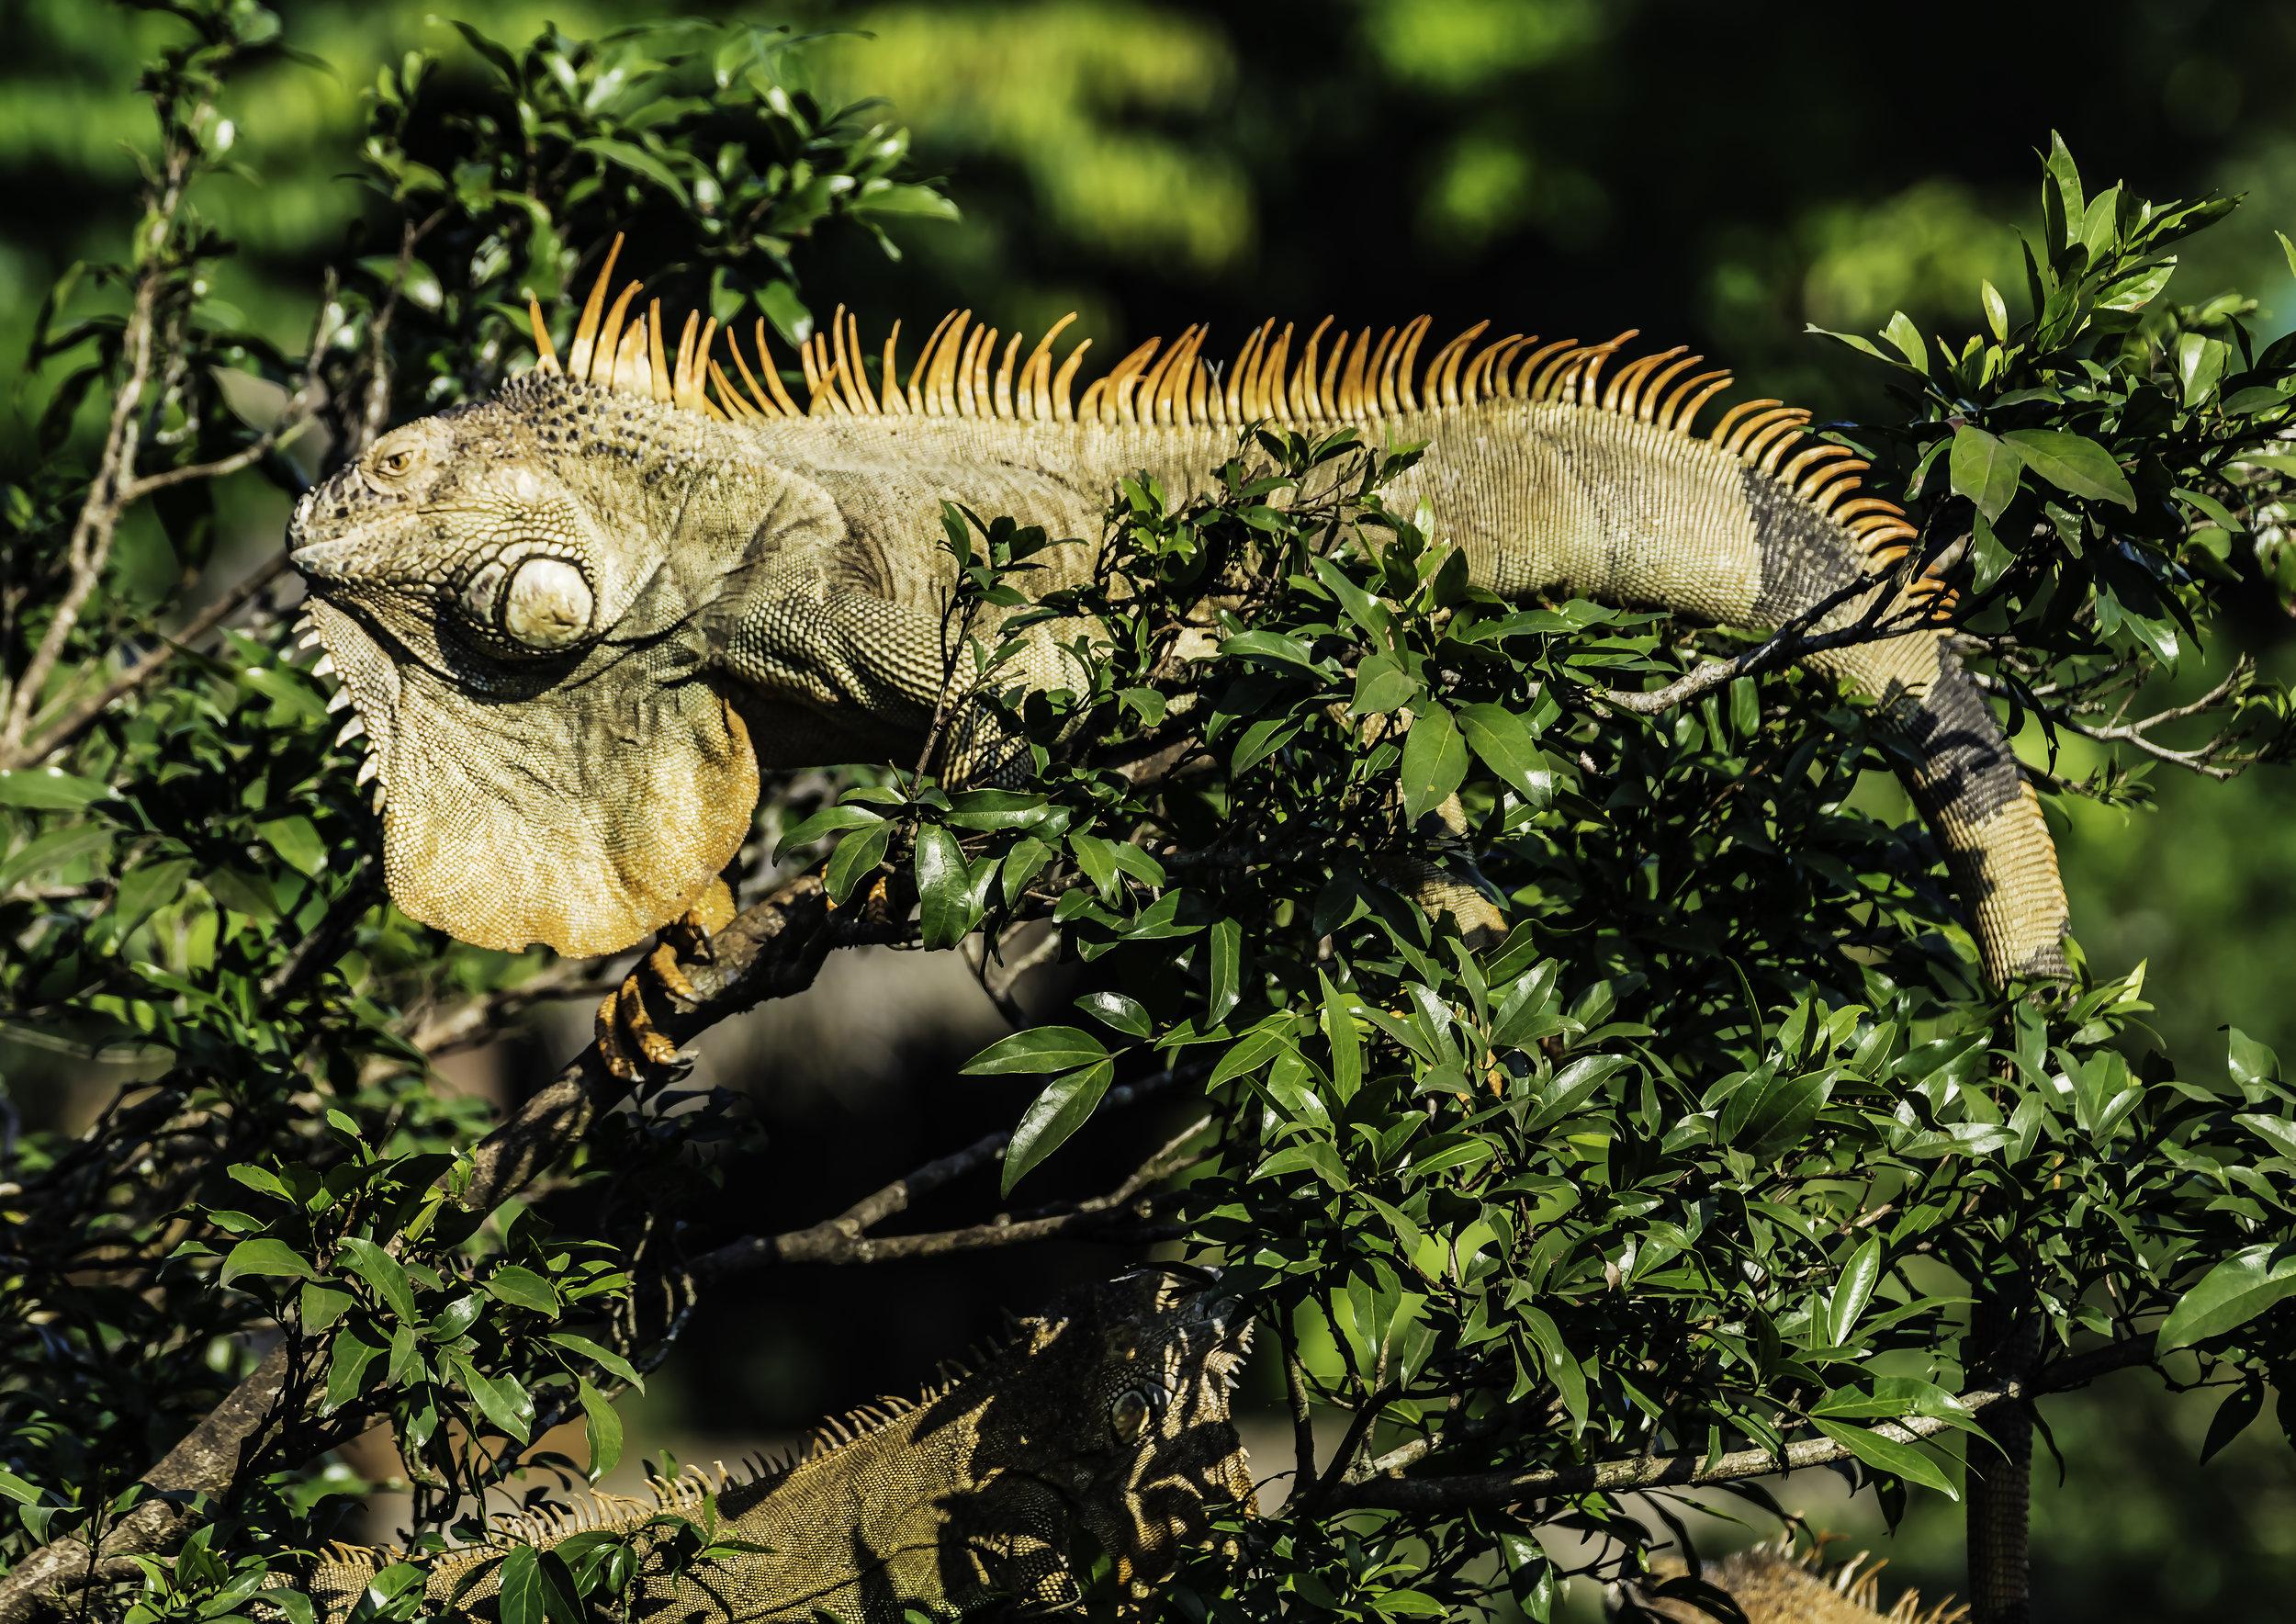 Costa Rican Iguana (4 feet+)